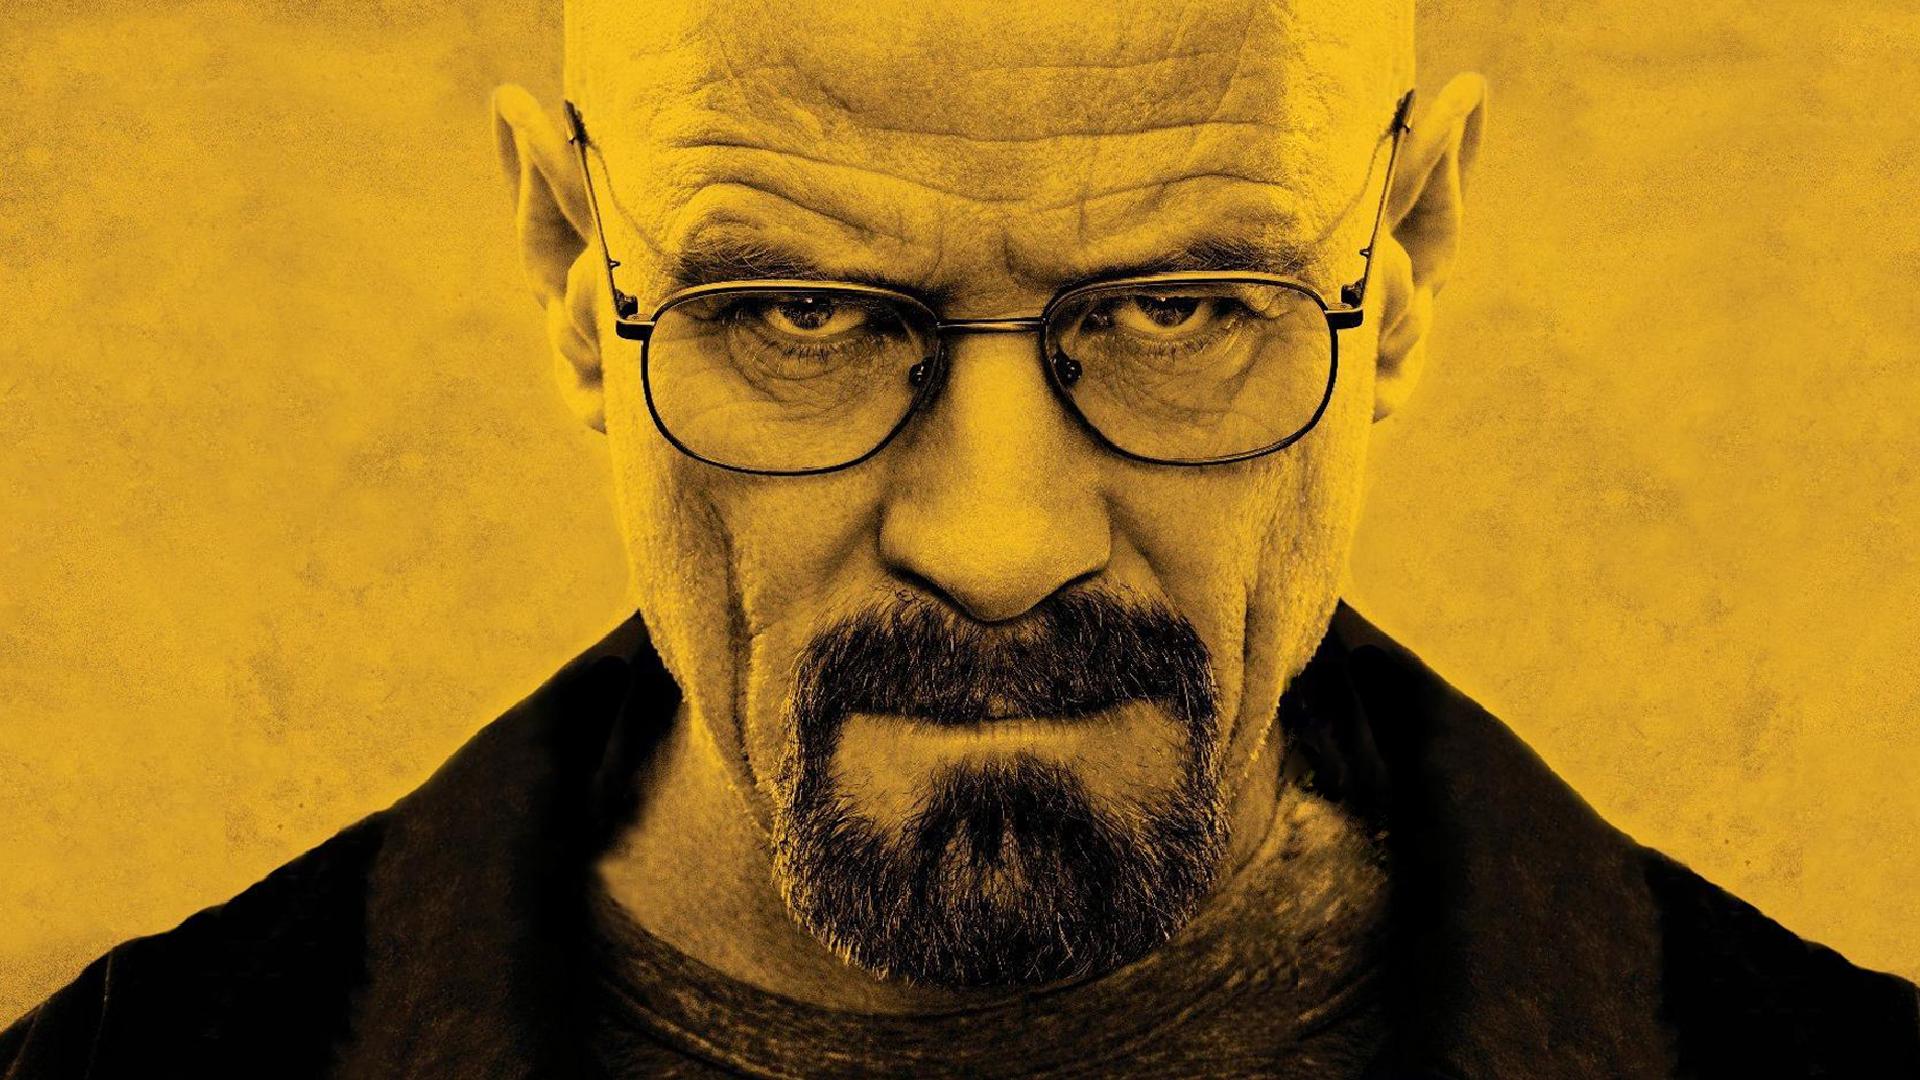 BRYAN CRANSTON Actor PHOTO Print POSTER Movie Breaking Bad Walter White 001